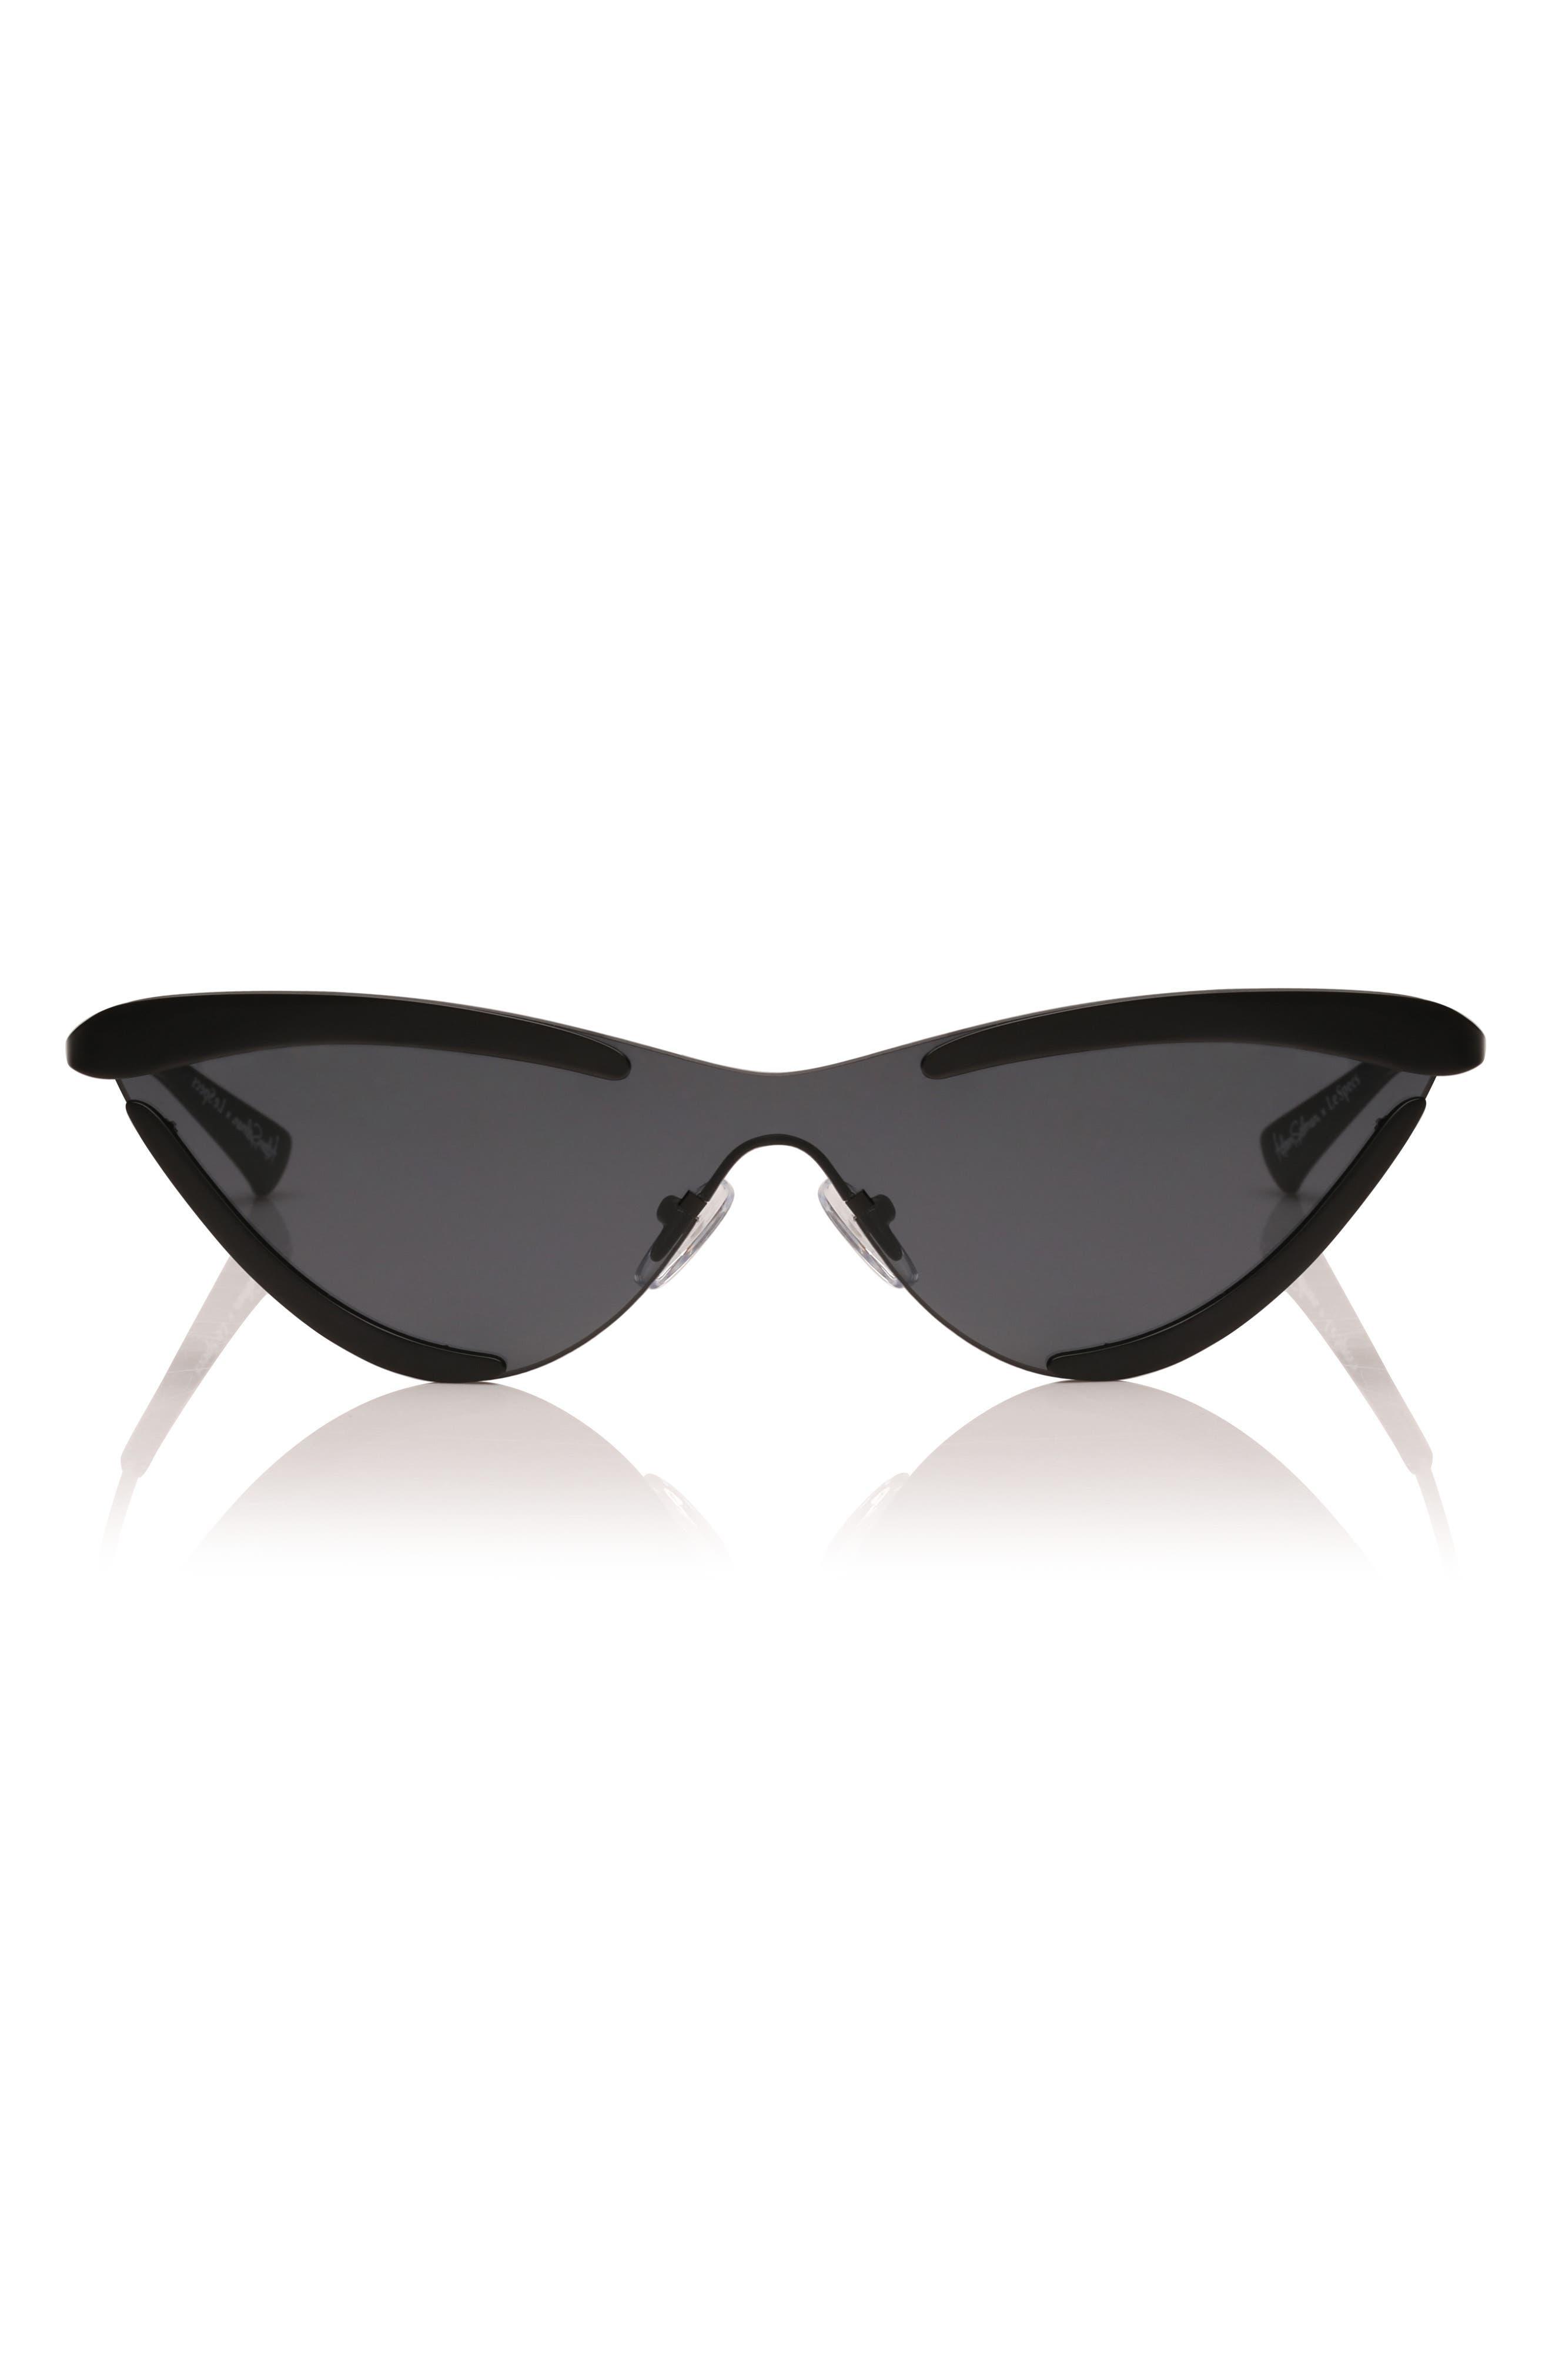 Adam Selman X Le Specs Luxe The Scandal 142Mm Cat Eye Sunglasses - Black Satin